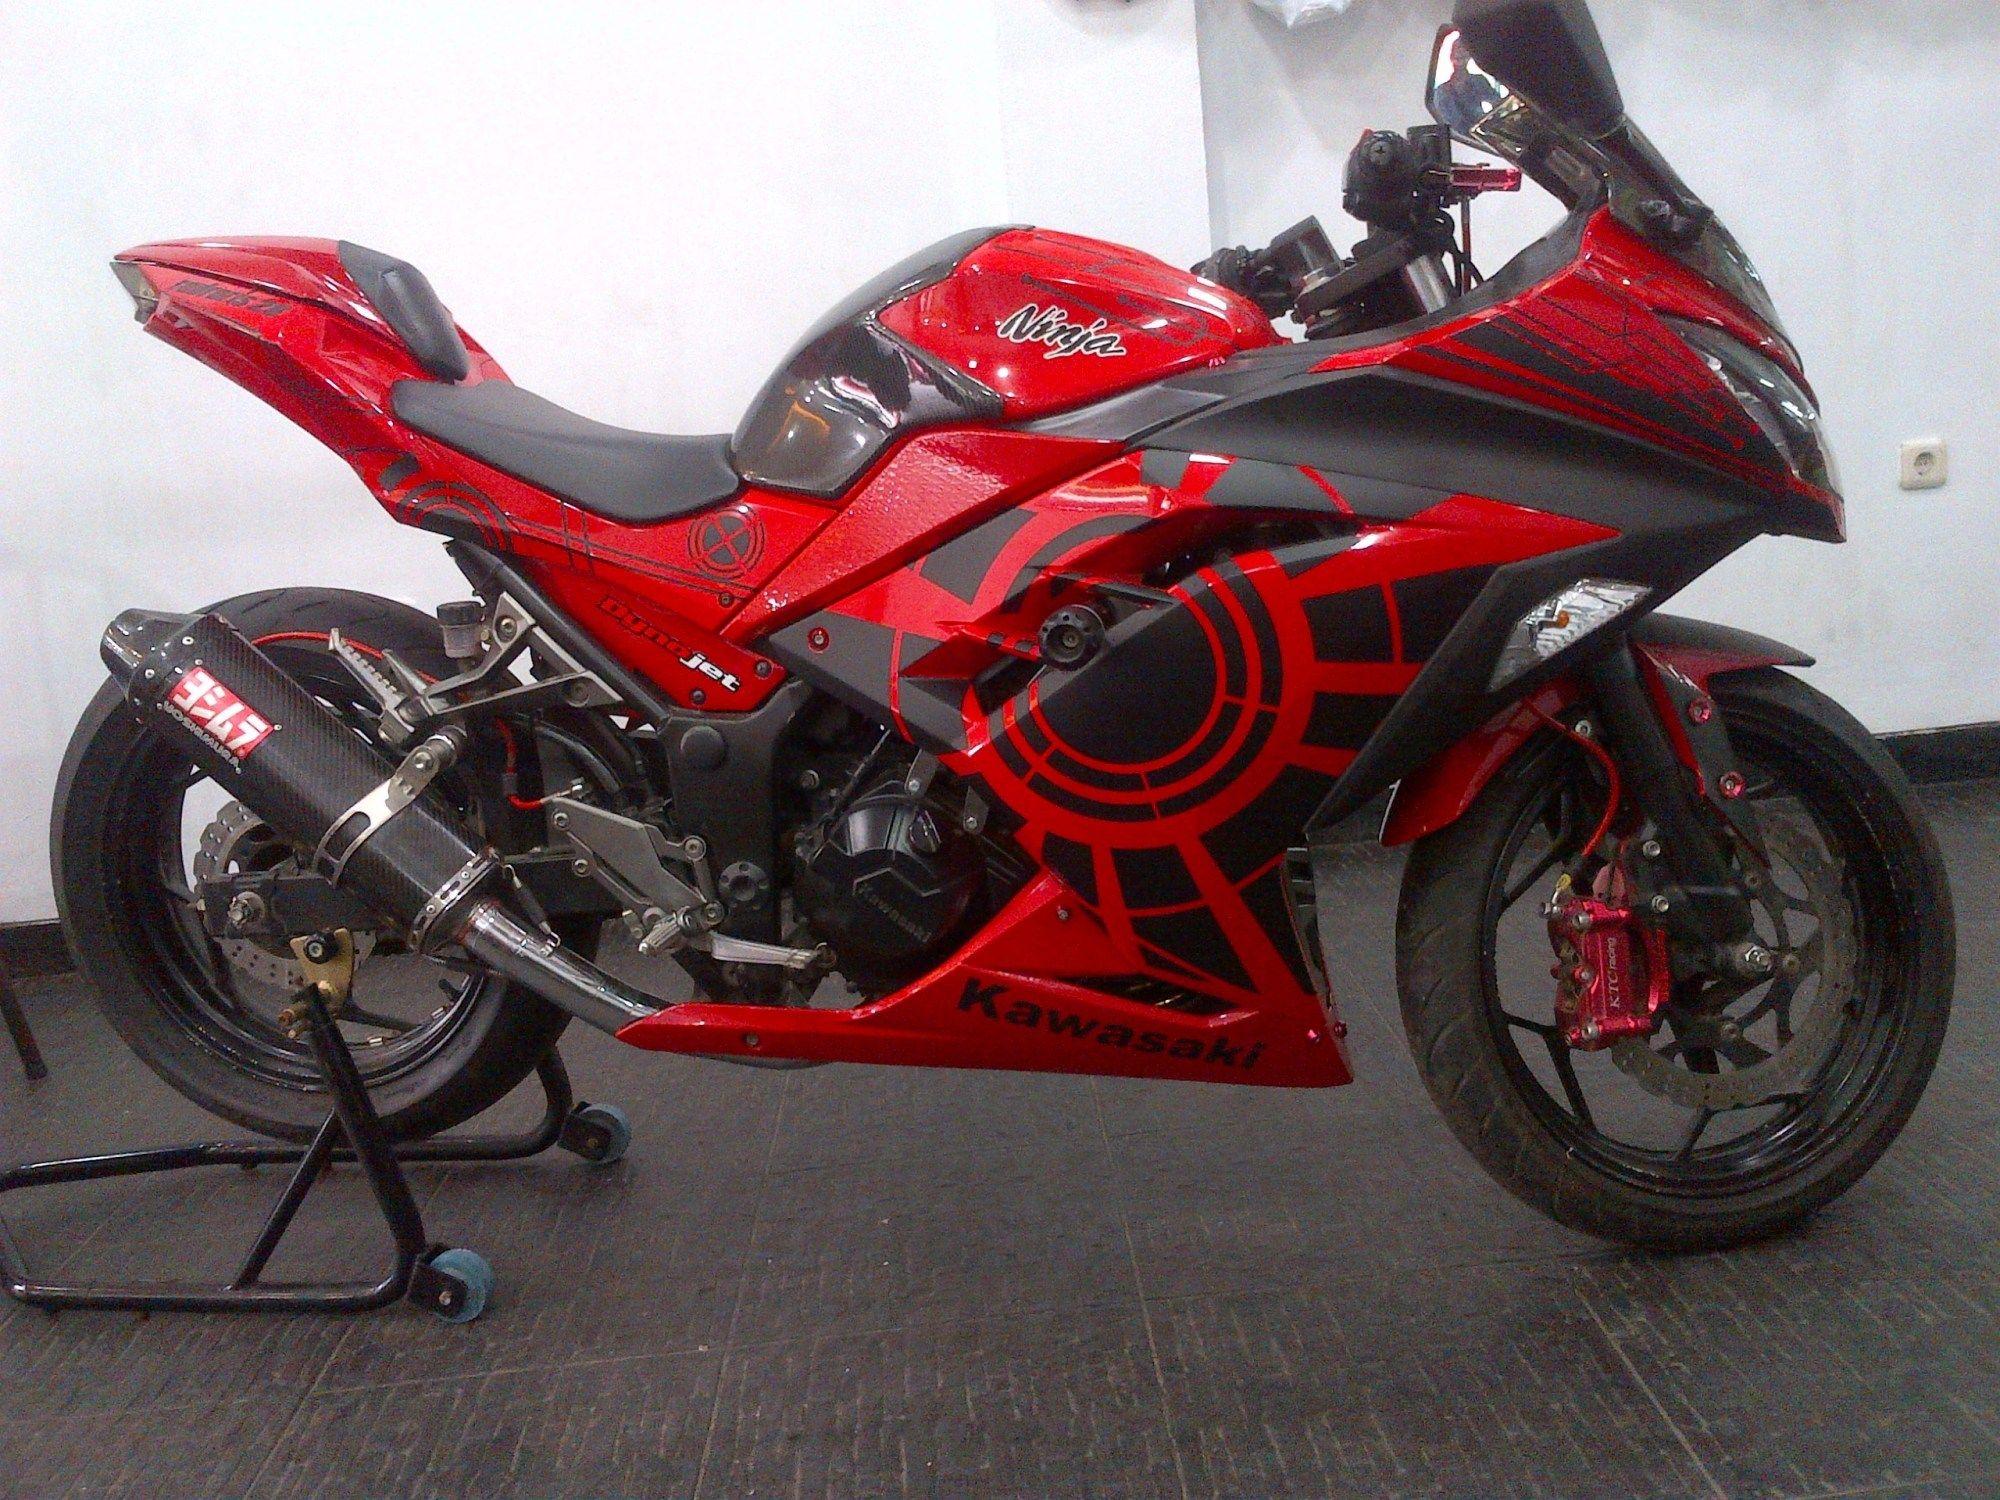 modifikasi motor kawasaki ninja 250 fi merah | modifikasi motor